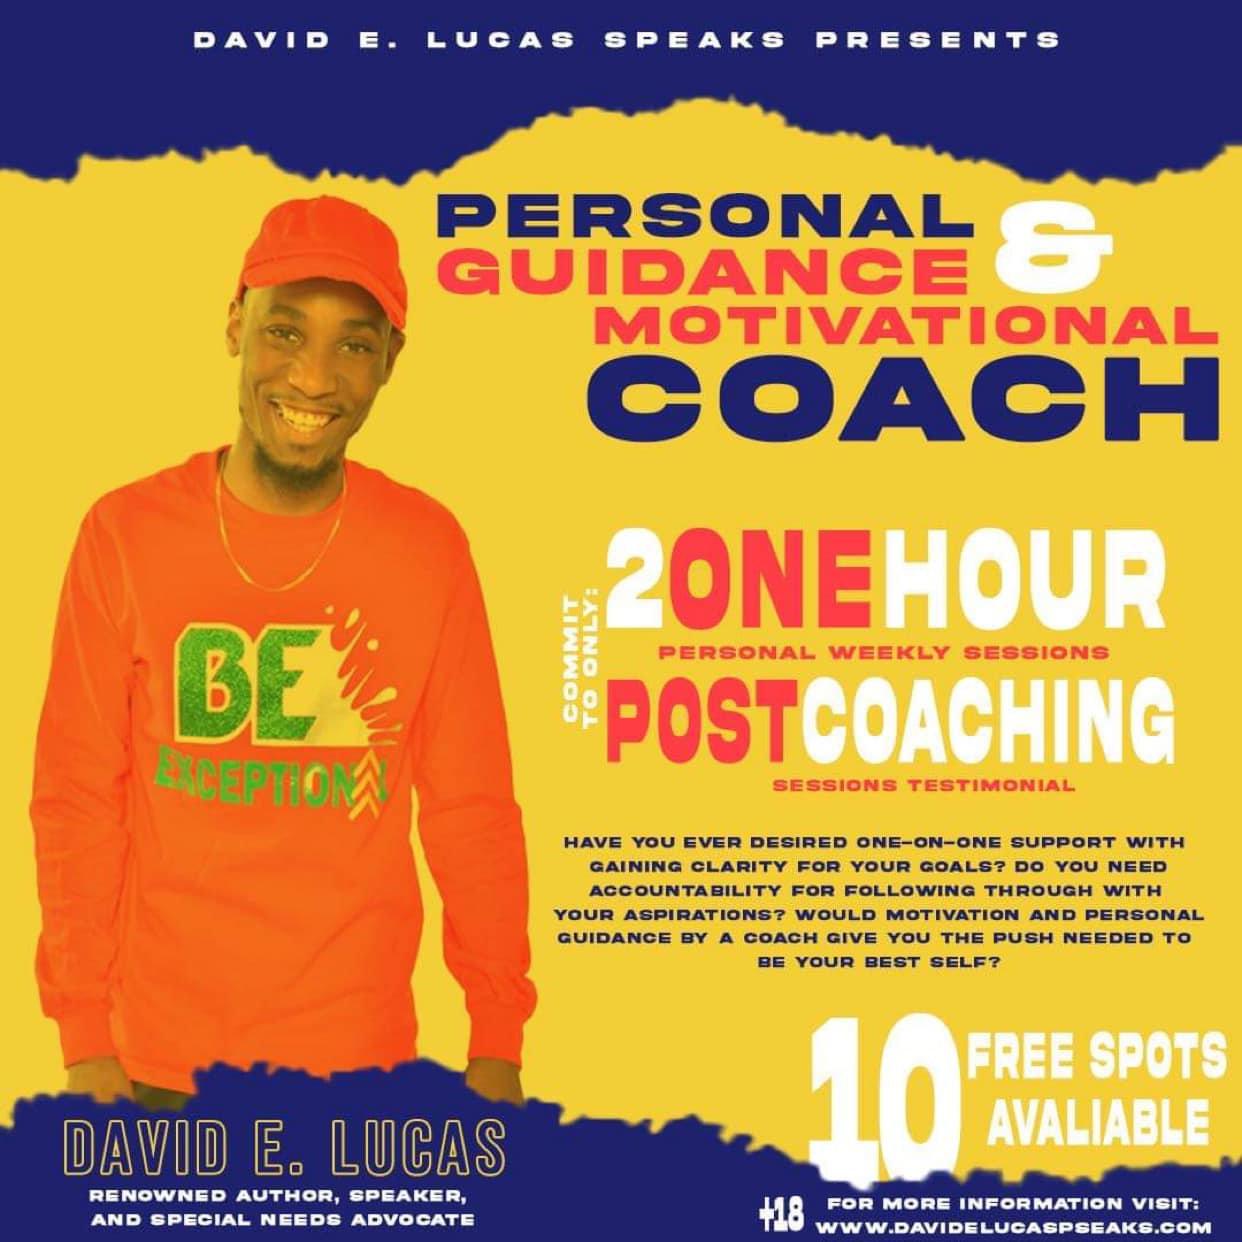 Personal & Guidance Motivational Coach